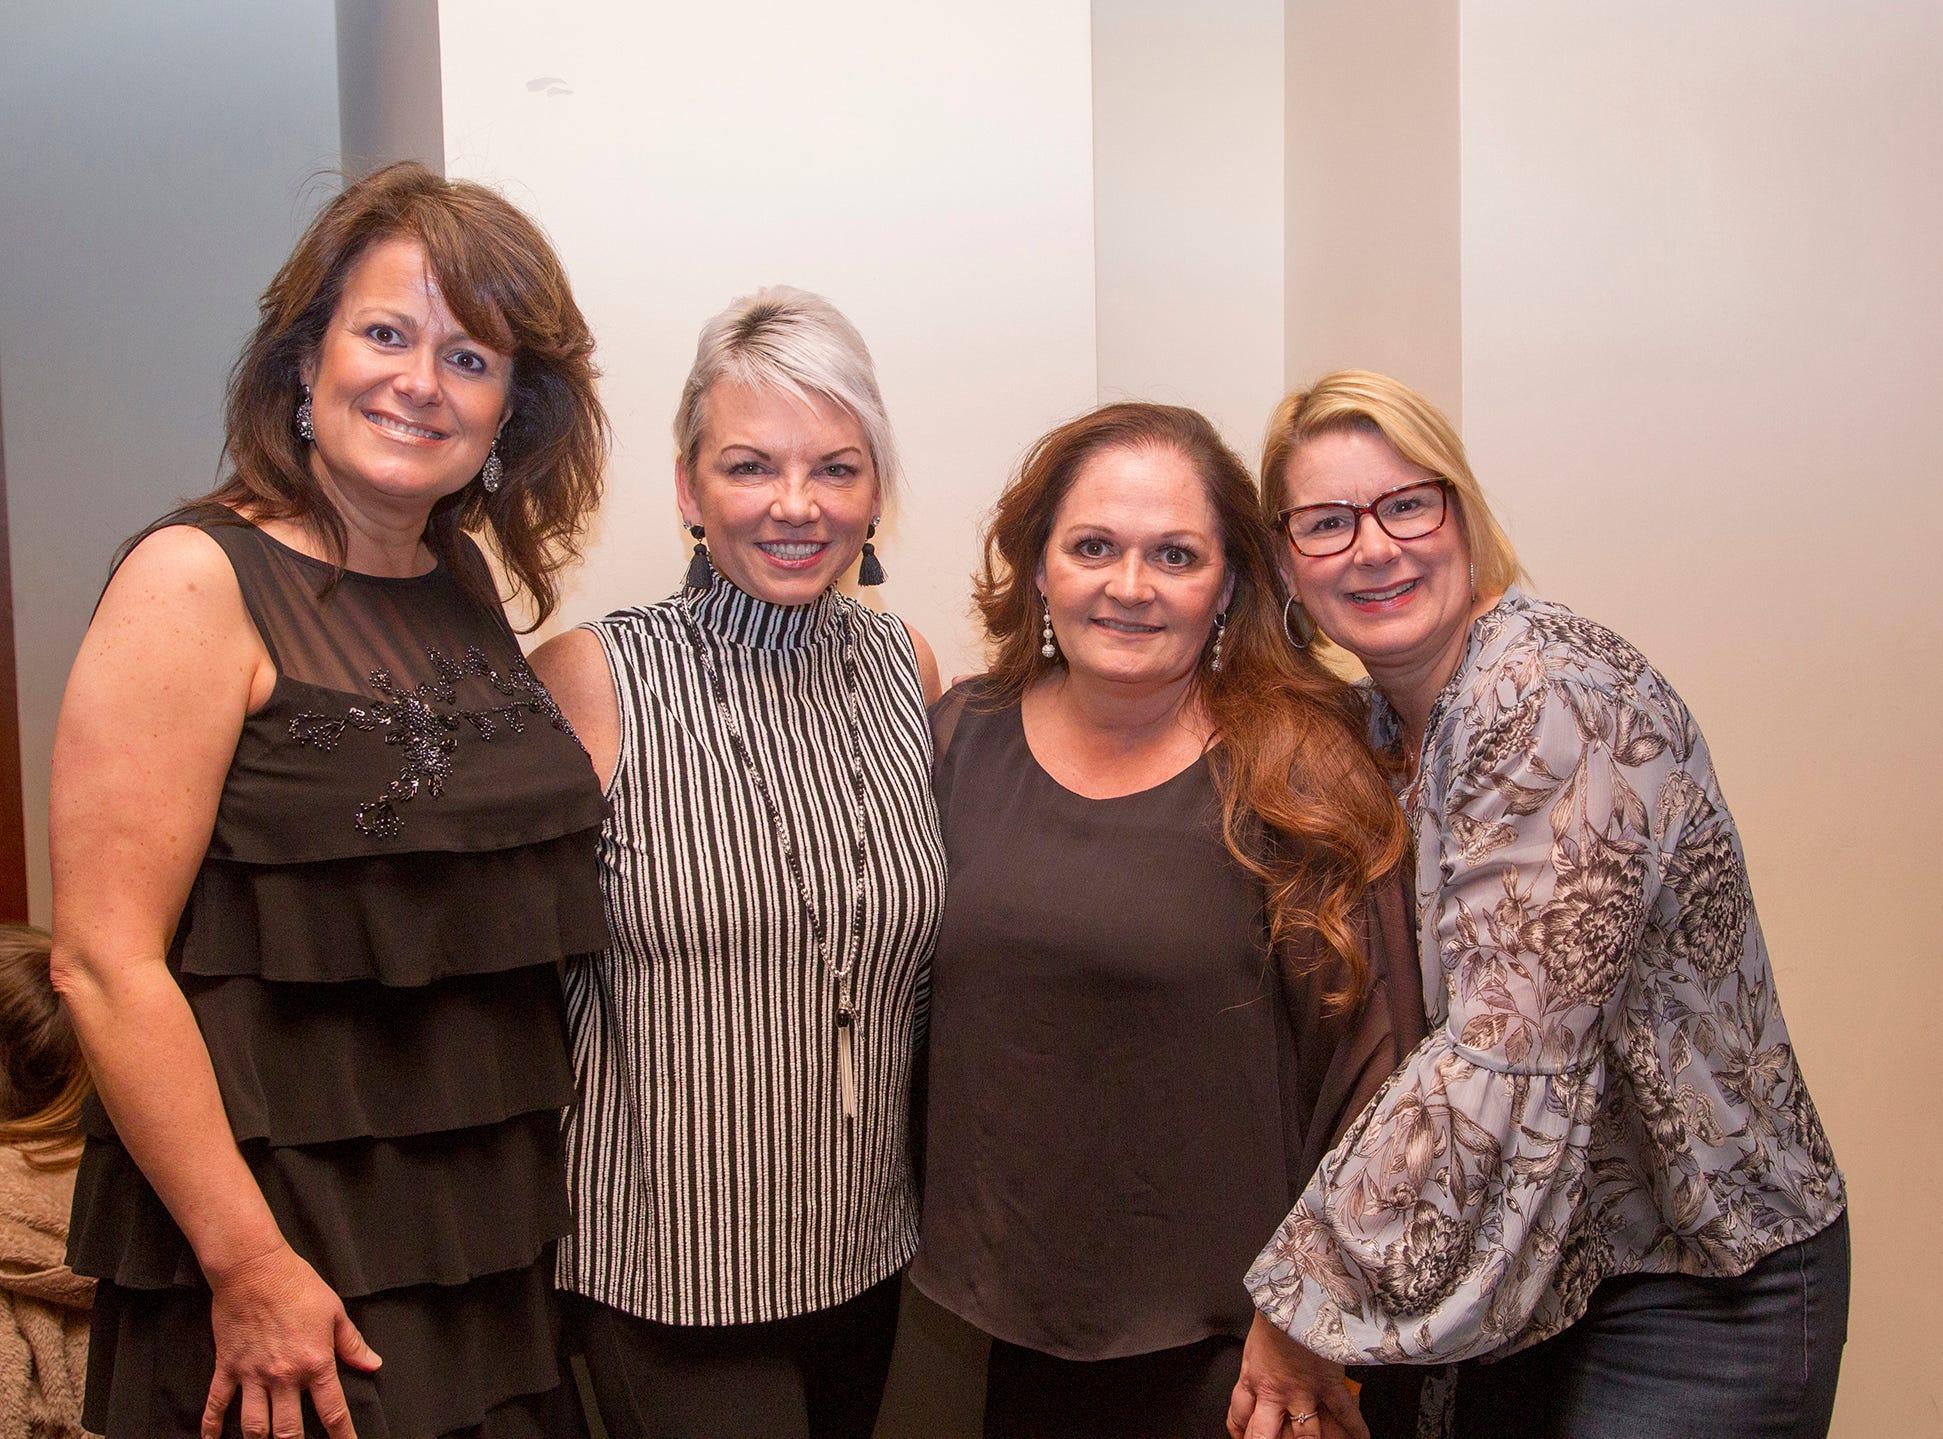 Laura Mc MIchael, JoAnn Romano, Rebecca Fitzgerald, Nanine Gallo. Anthony Kearns benefit concert to benefit Julia's Butterfly Foundation at West Side Presbyterian Church in Ridgewood. 3/23/2019